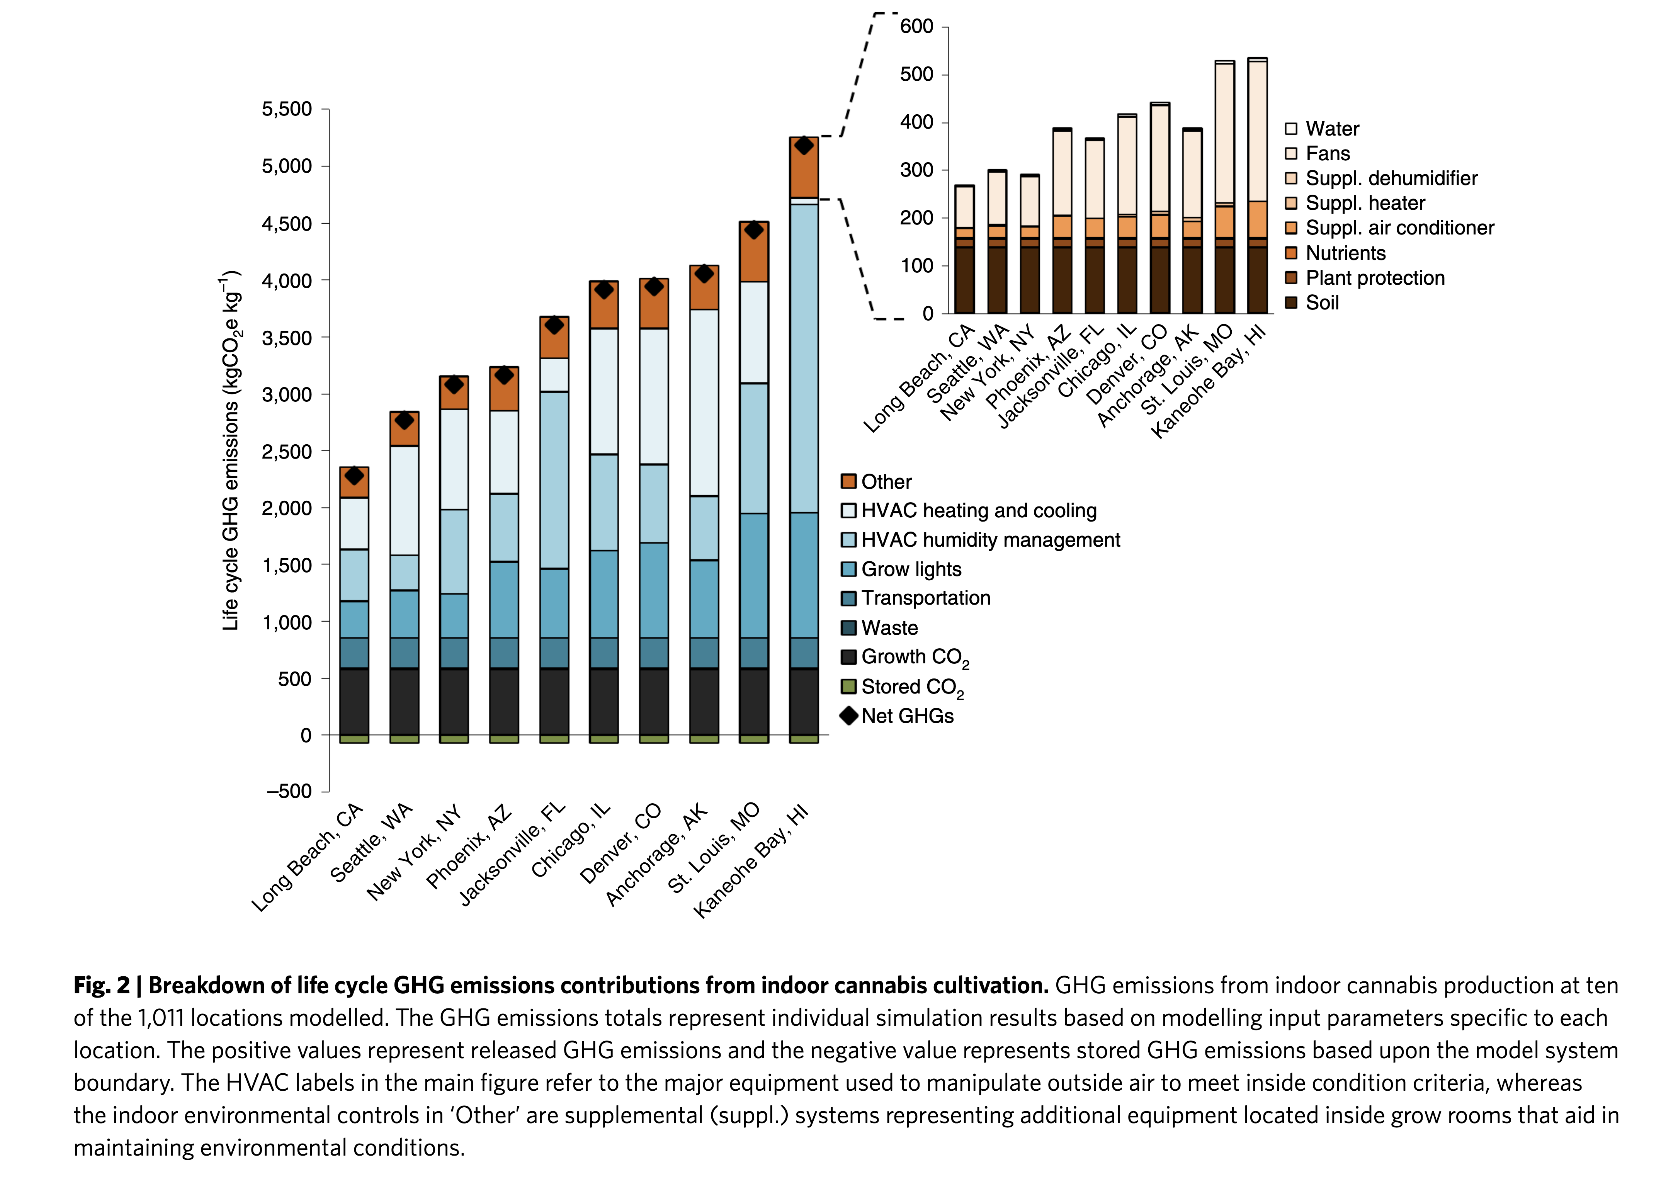 Nature Sustainability breakdown emissions